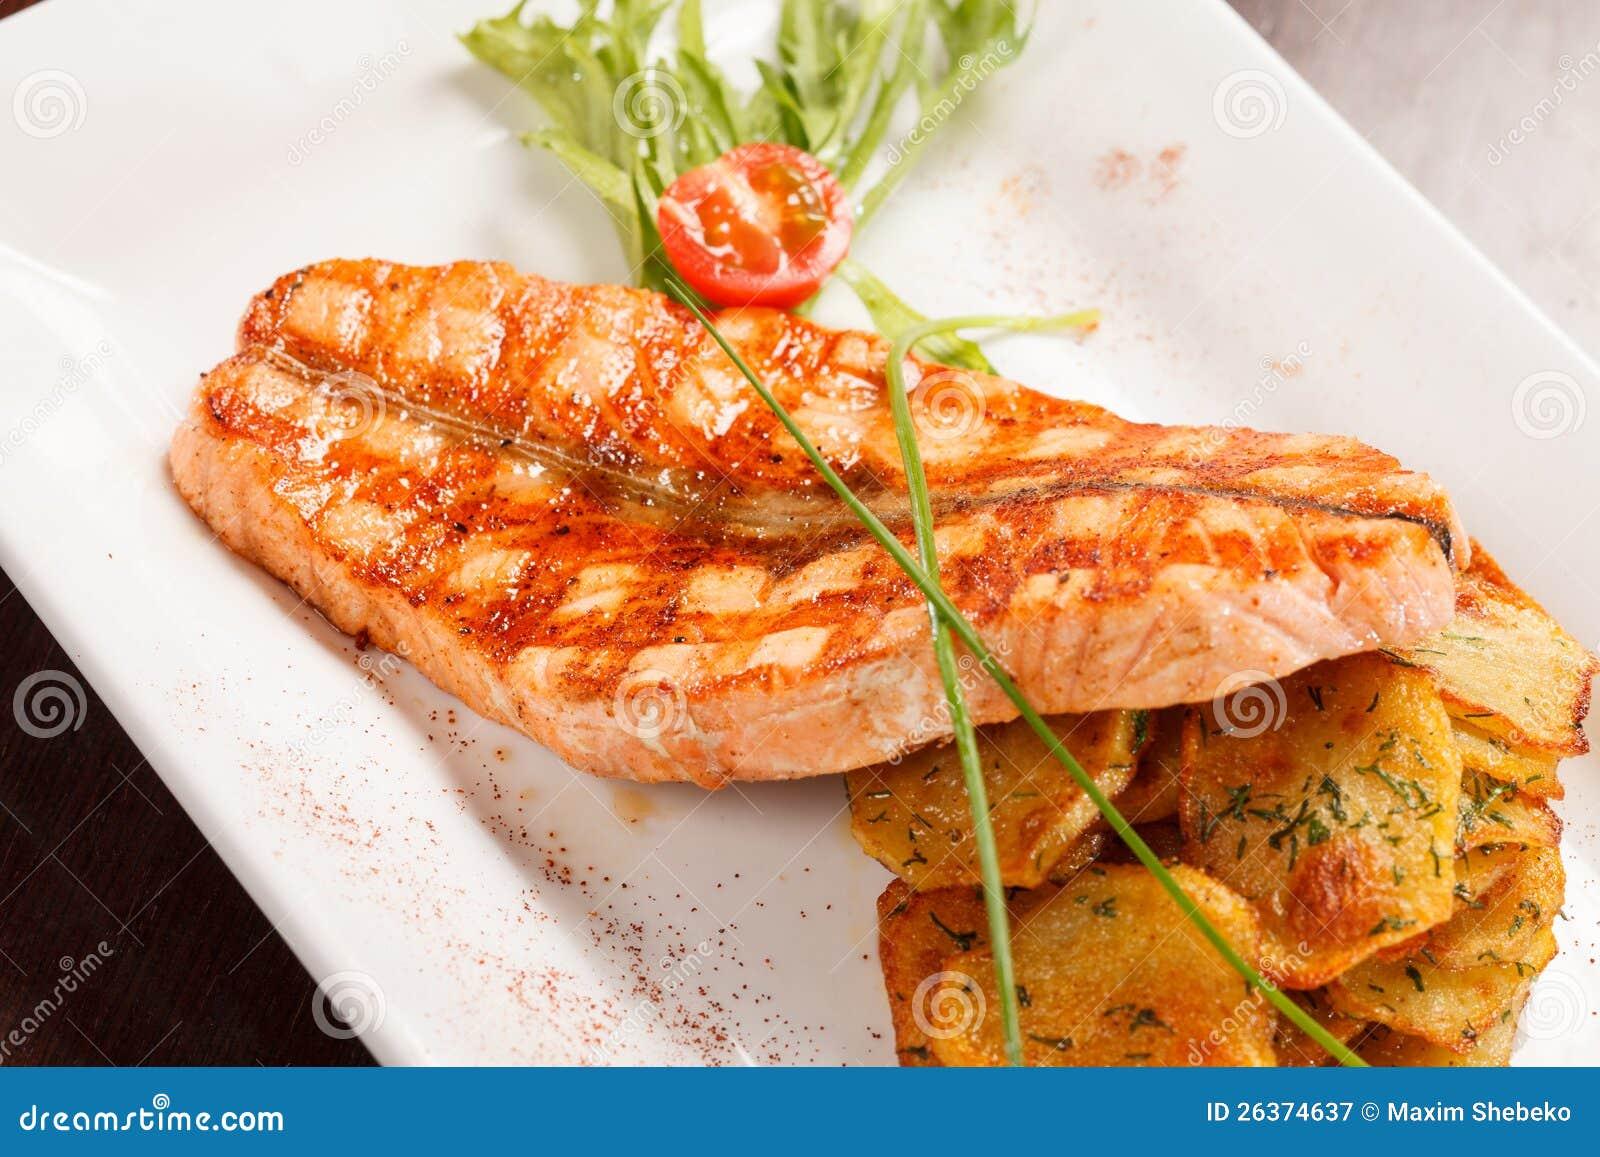 Salmon steak with potatoes